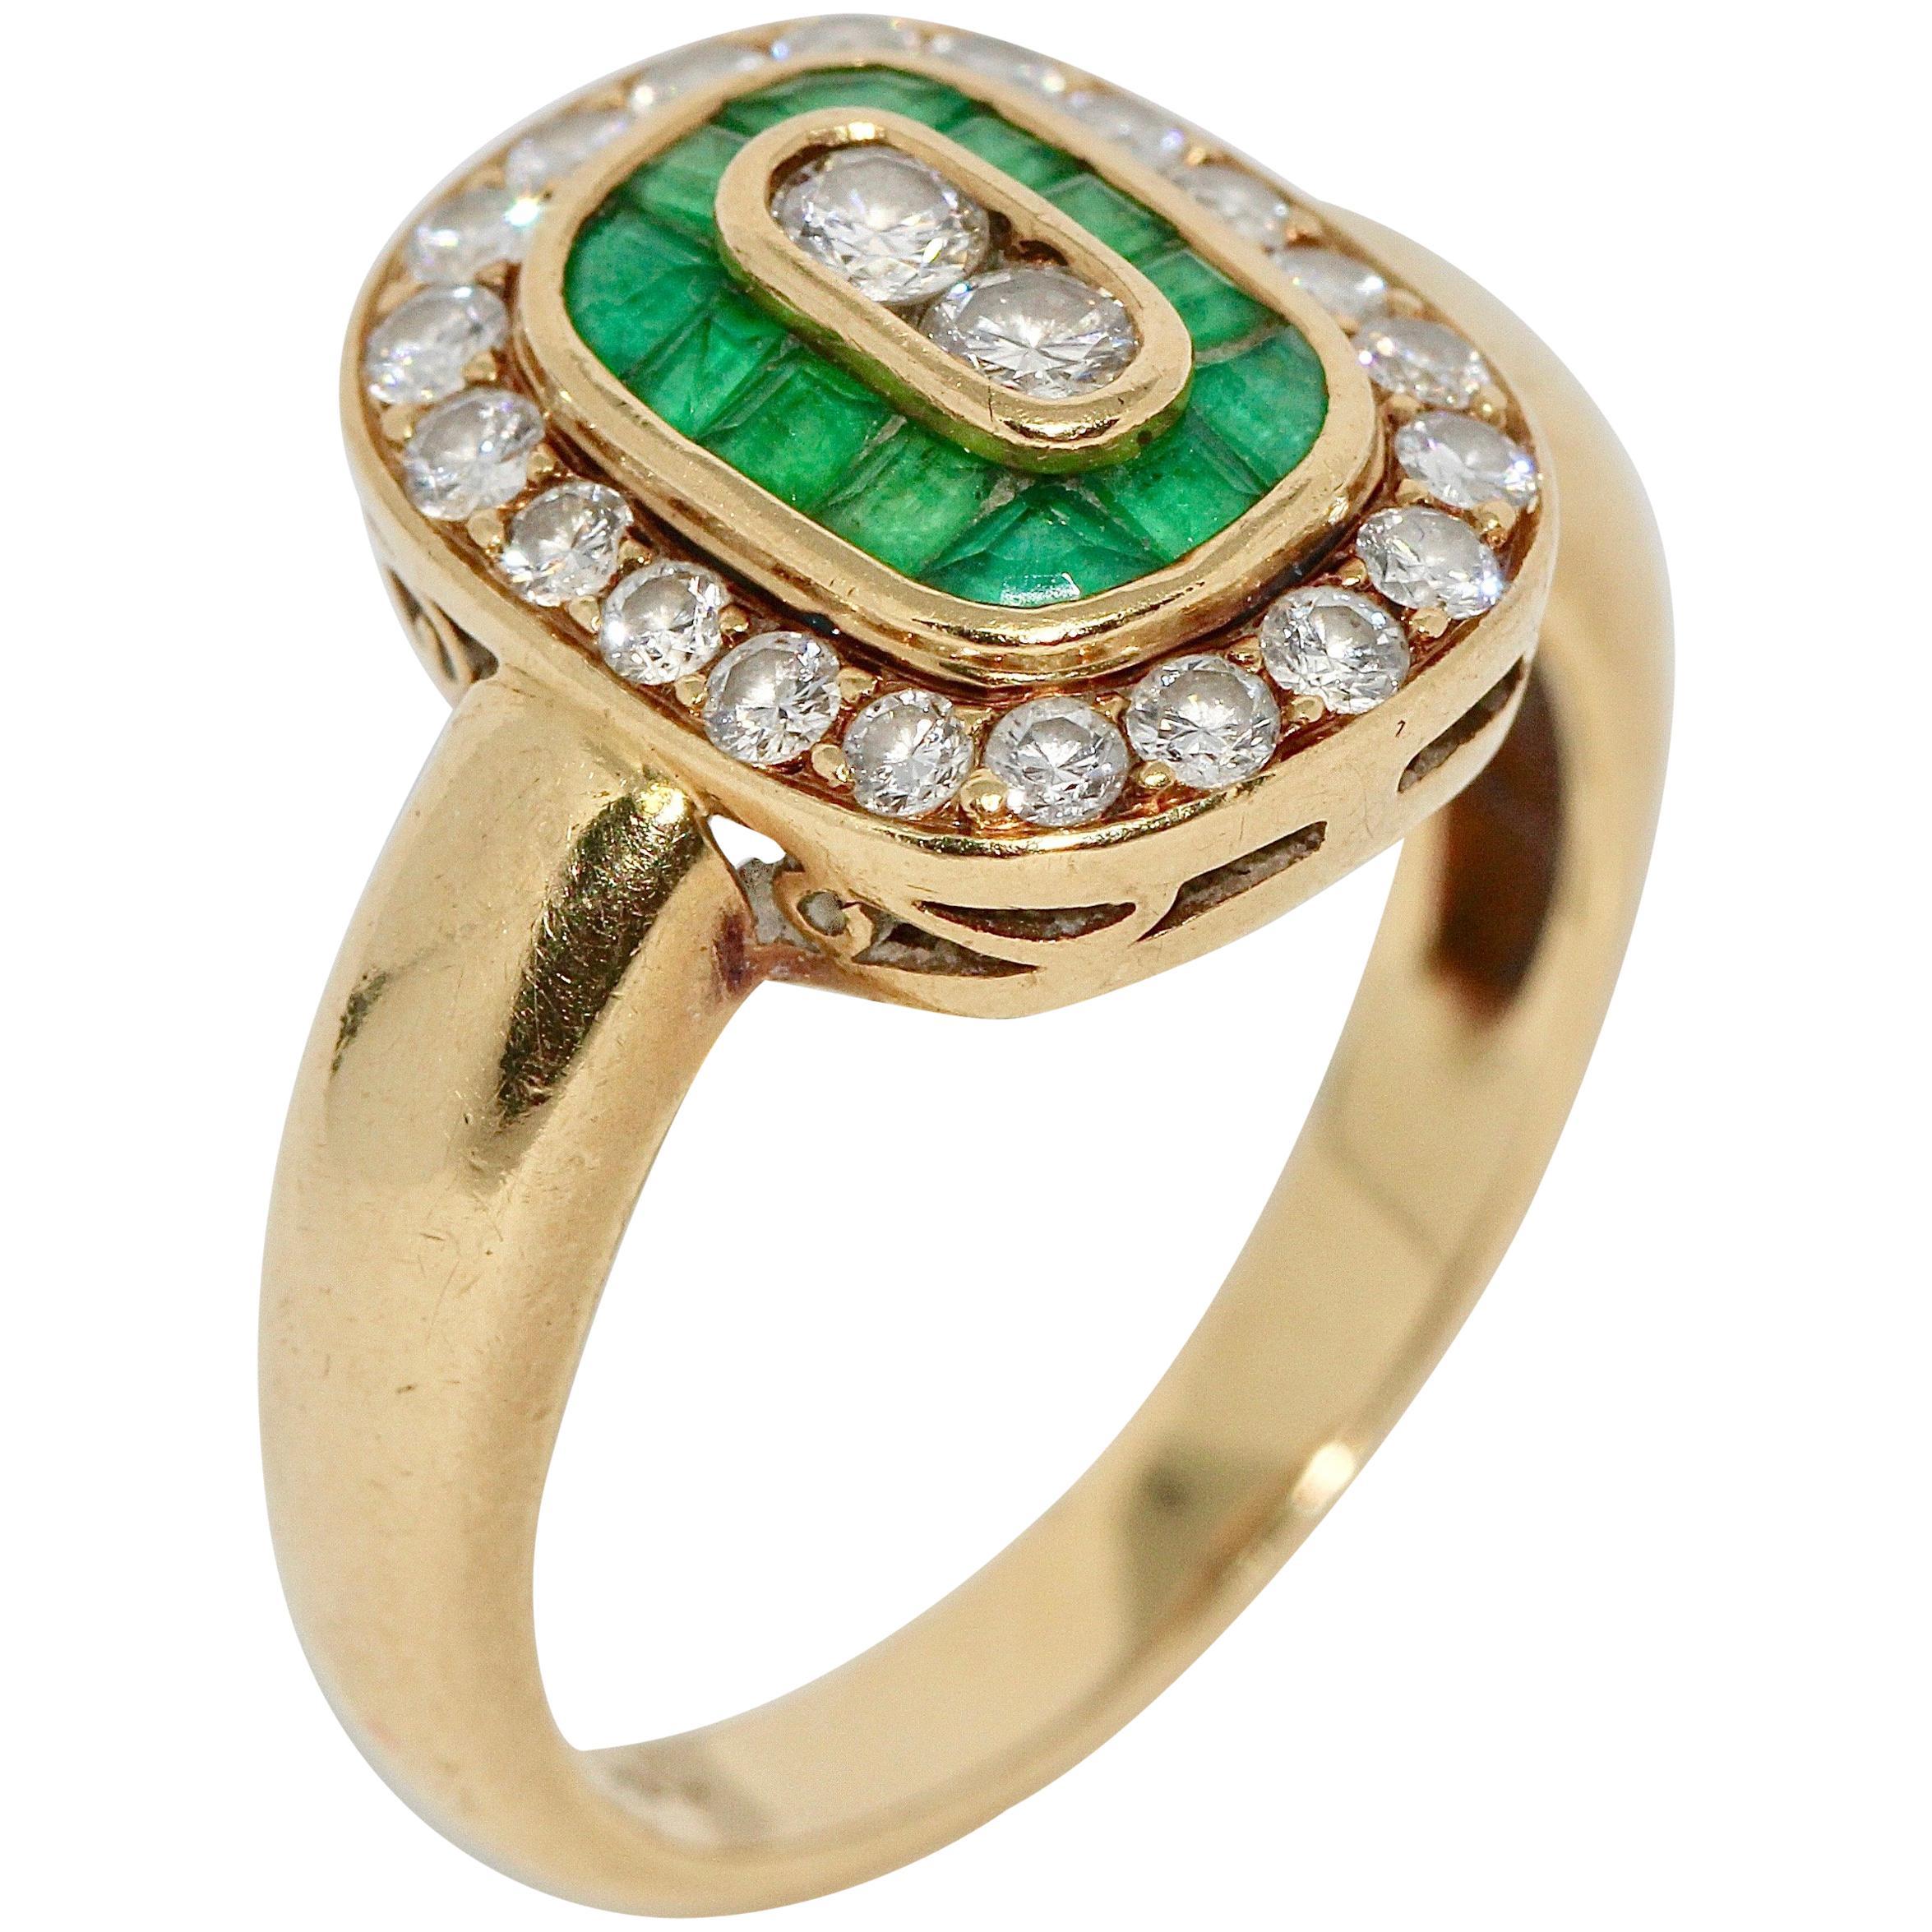 Ladies Diamond Ring, 18 Karat Gold with Emeralds